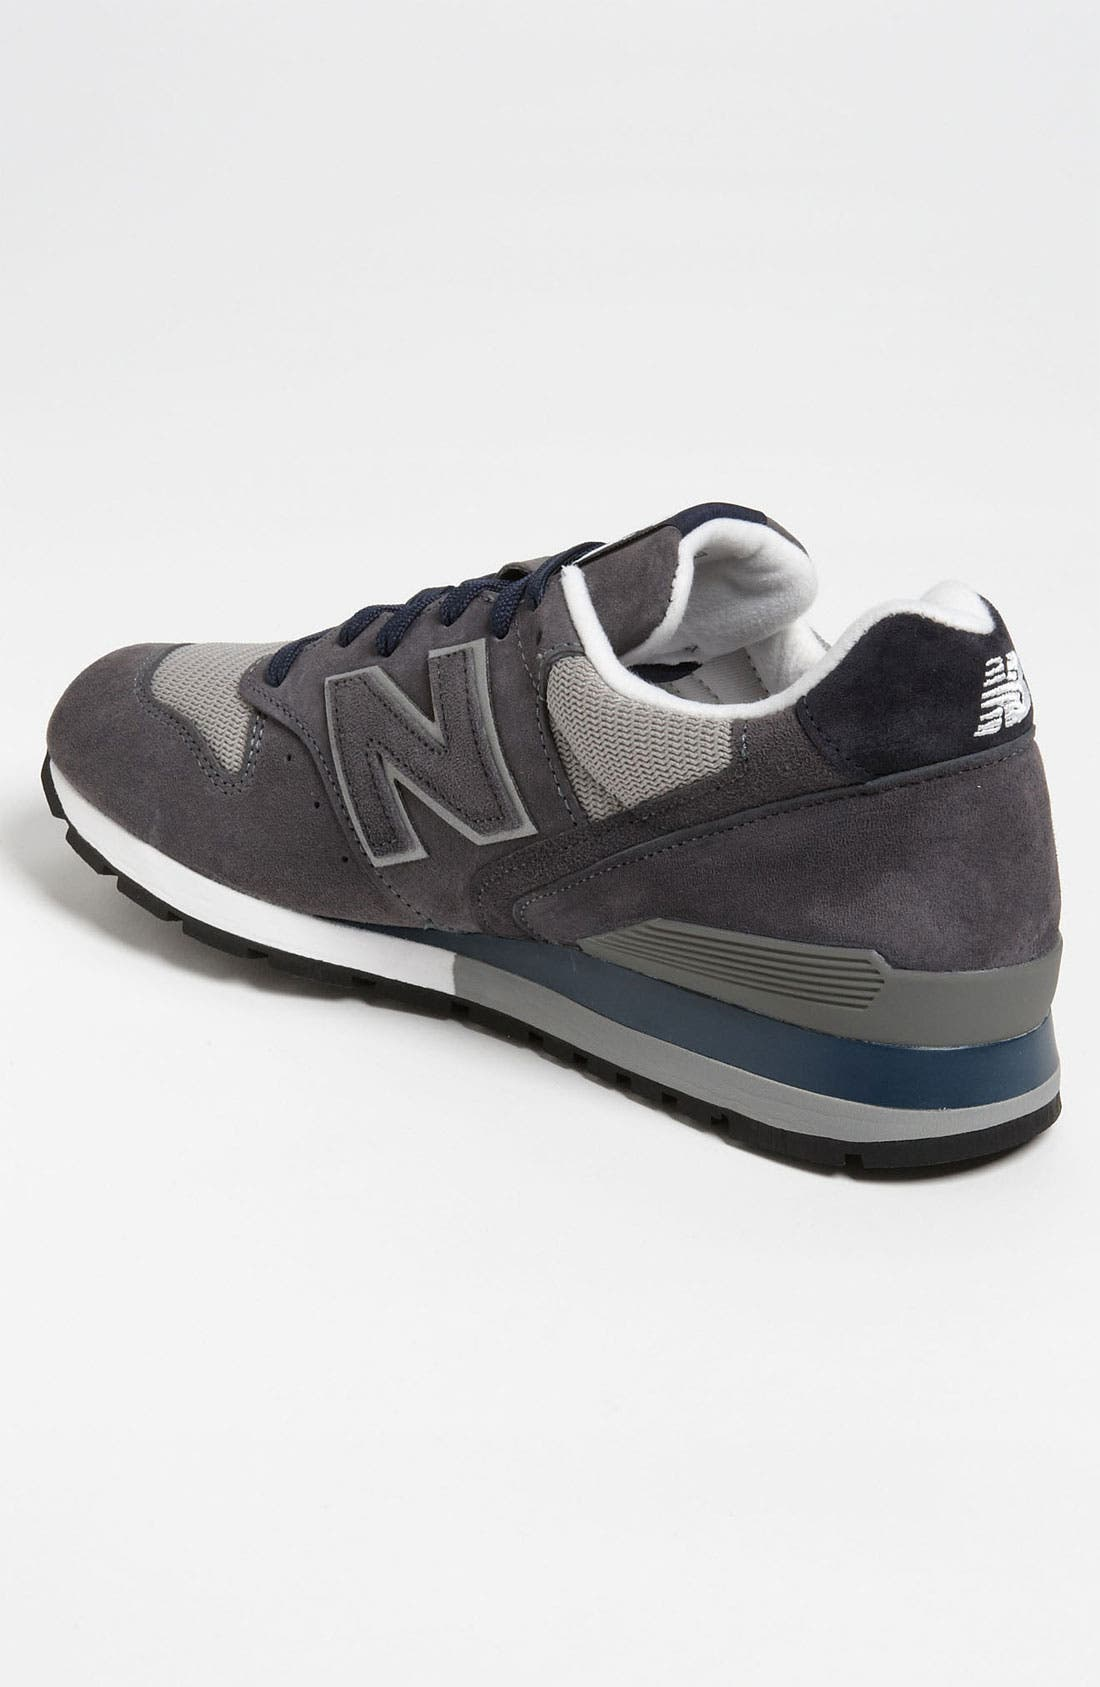 NEW BALANCE, '996' Sneaker, Alternate thumbnail 2, color, 030